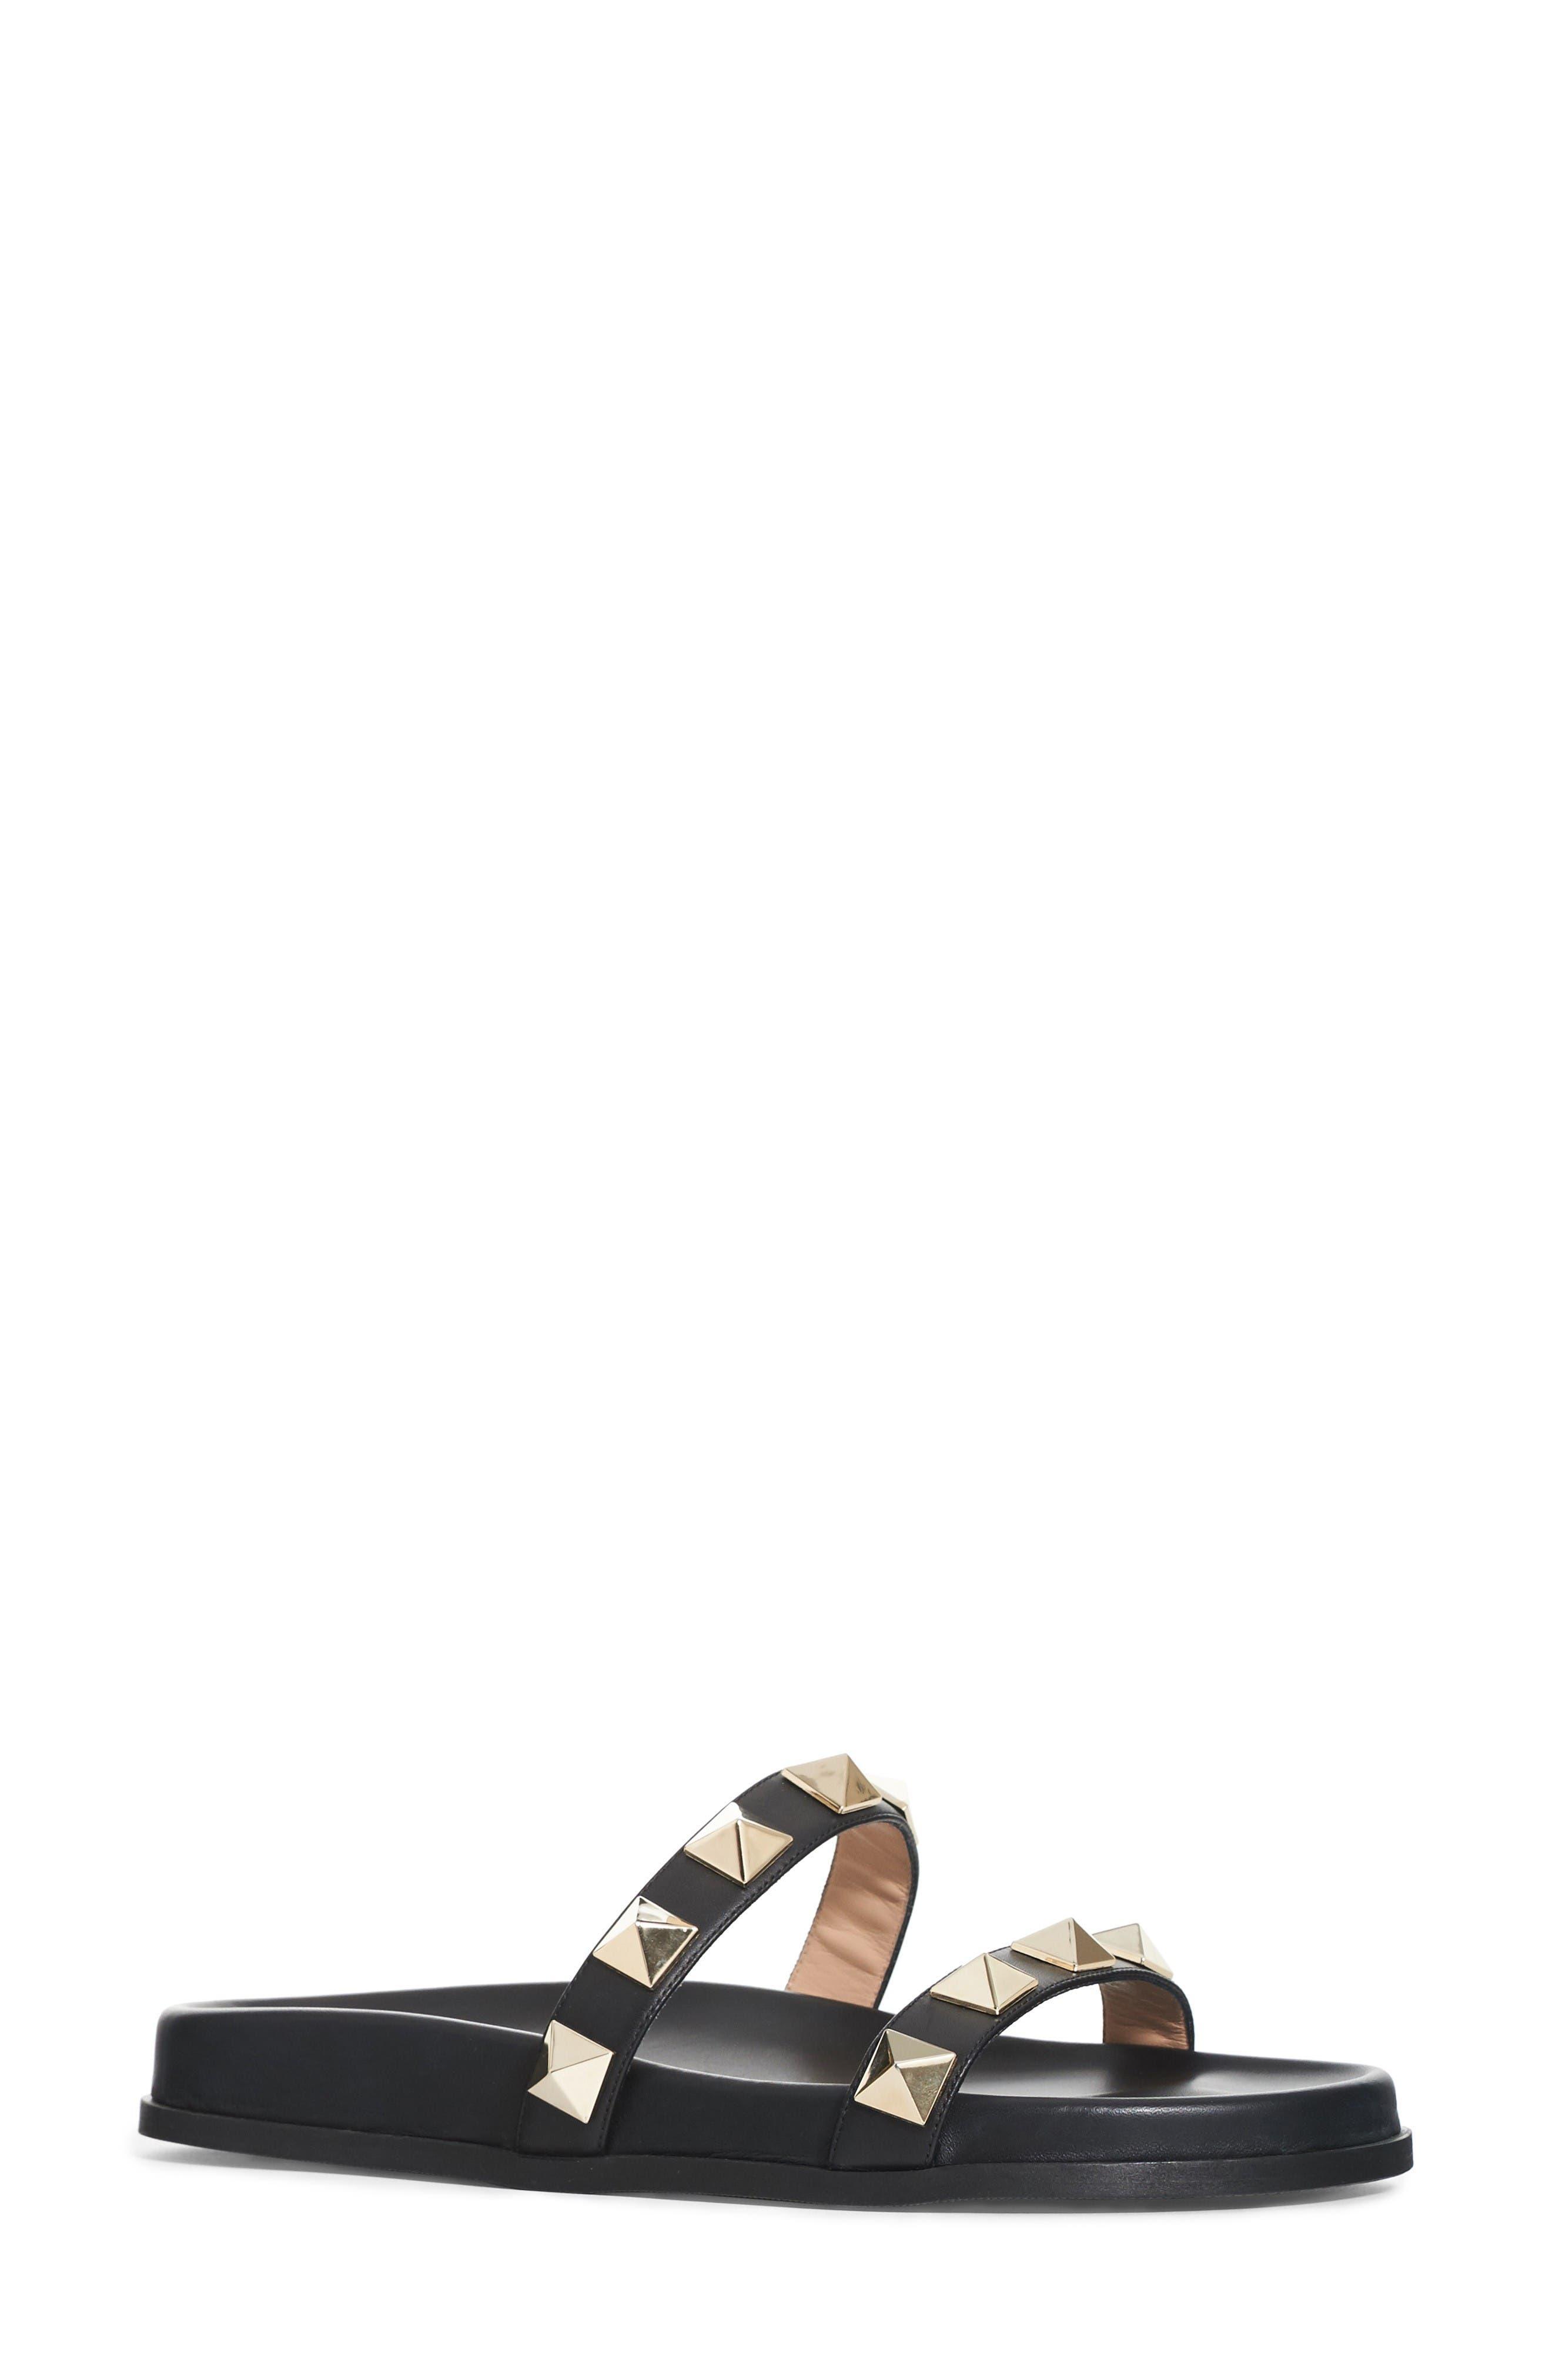 Valentino Rockstud Lock Slide Sandal (Women)